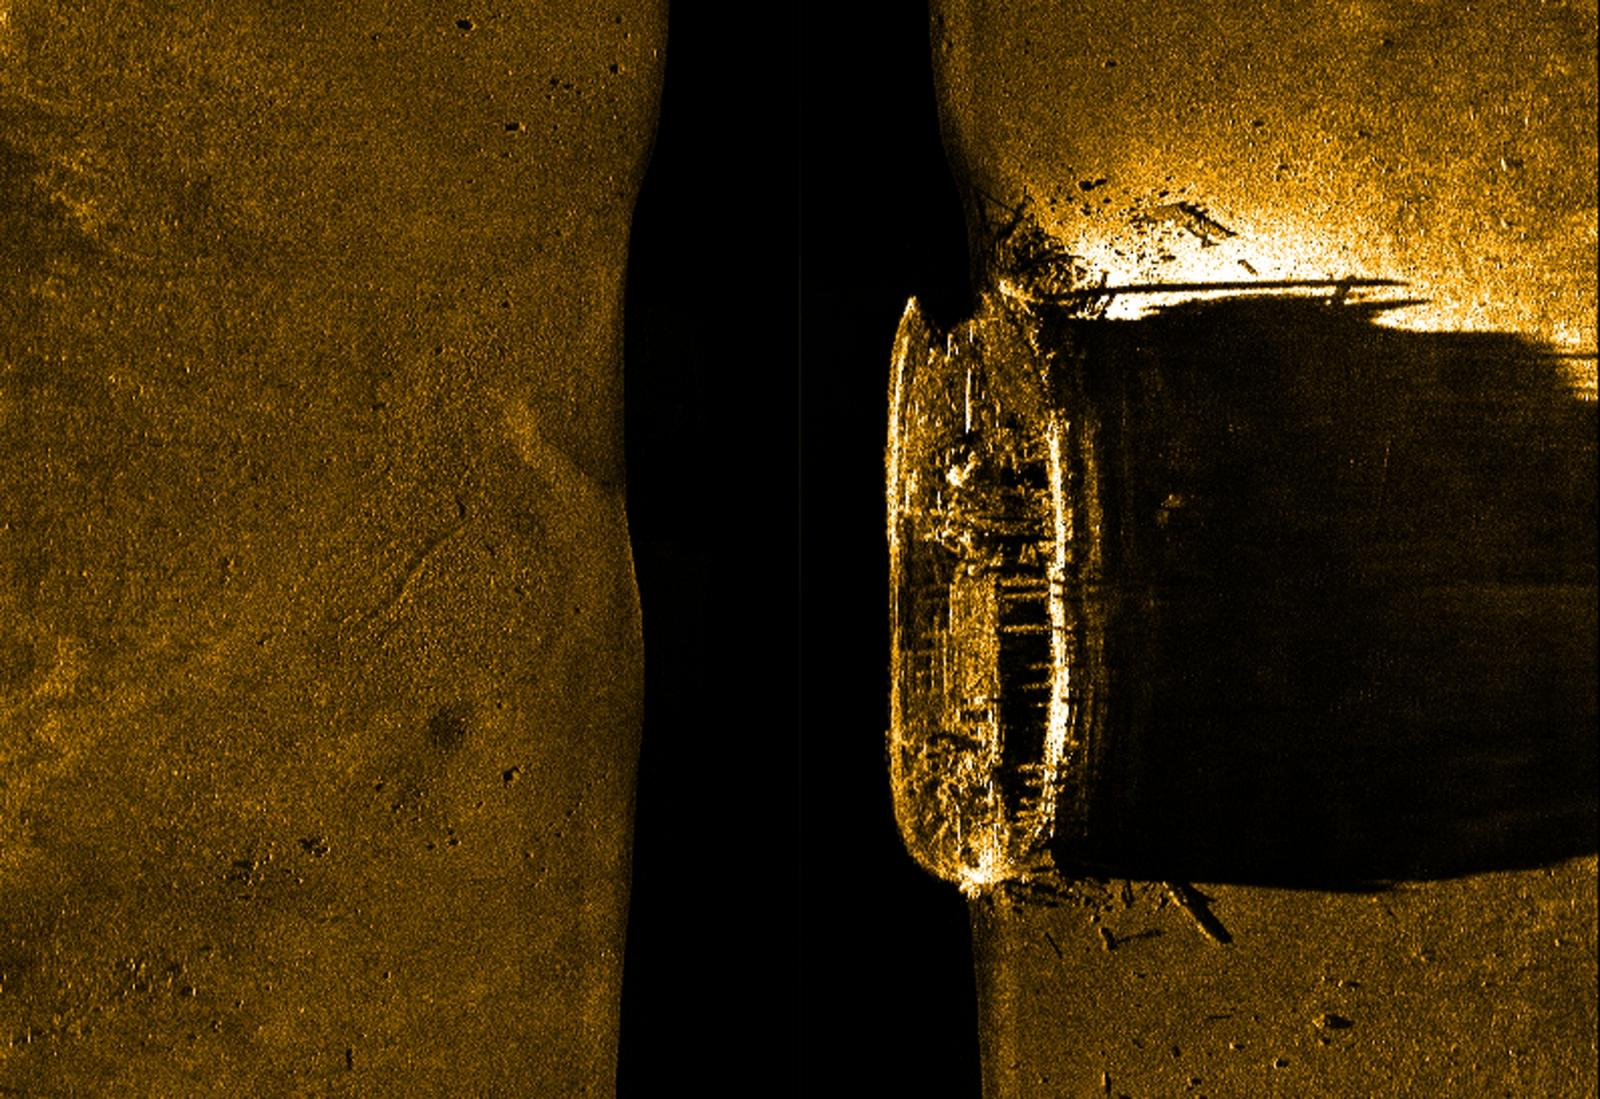 The shipwreck of HMS Erebus, sunk off King William Island in northern Canada